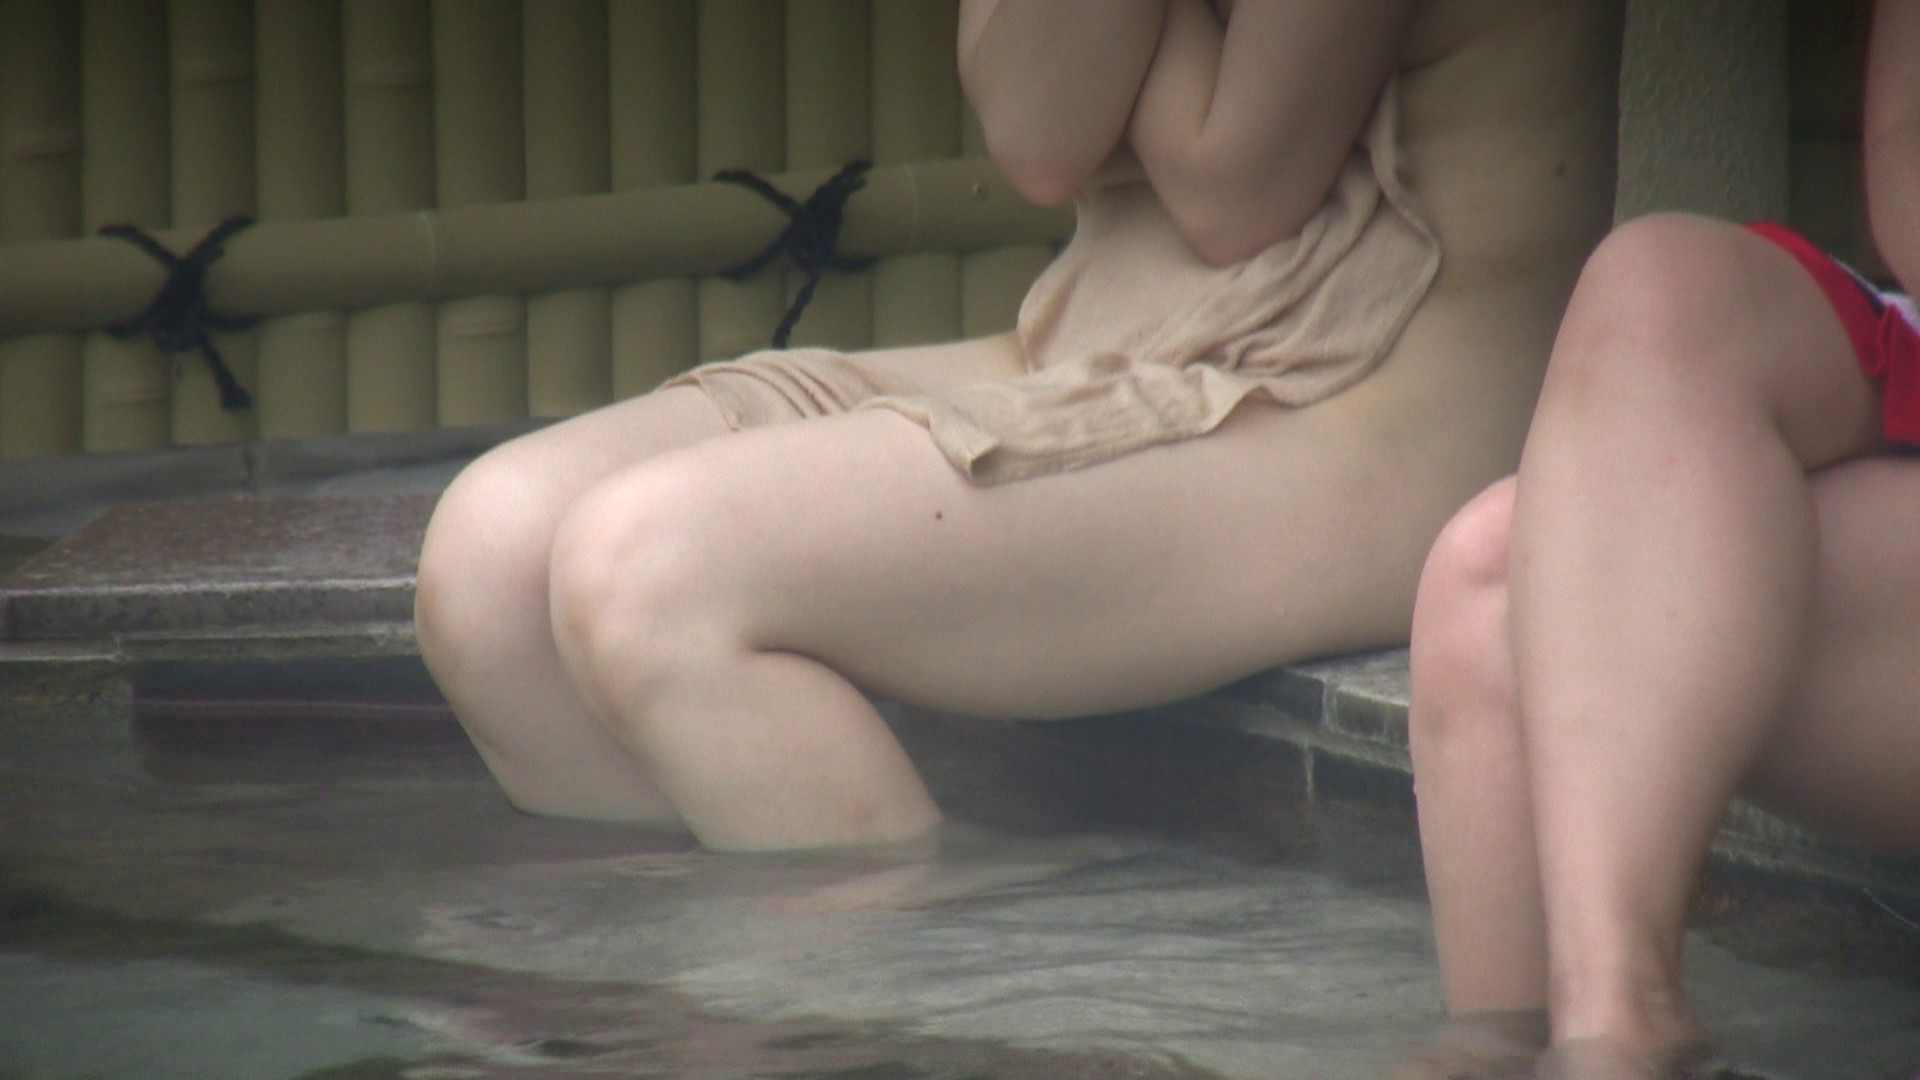 Aquaな露天風呂Vol.128 盗撮 | HなOL  51pic 27